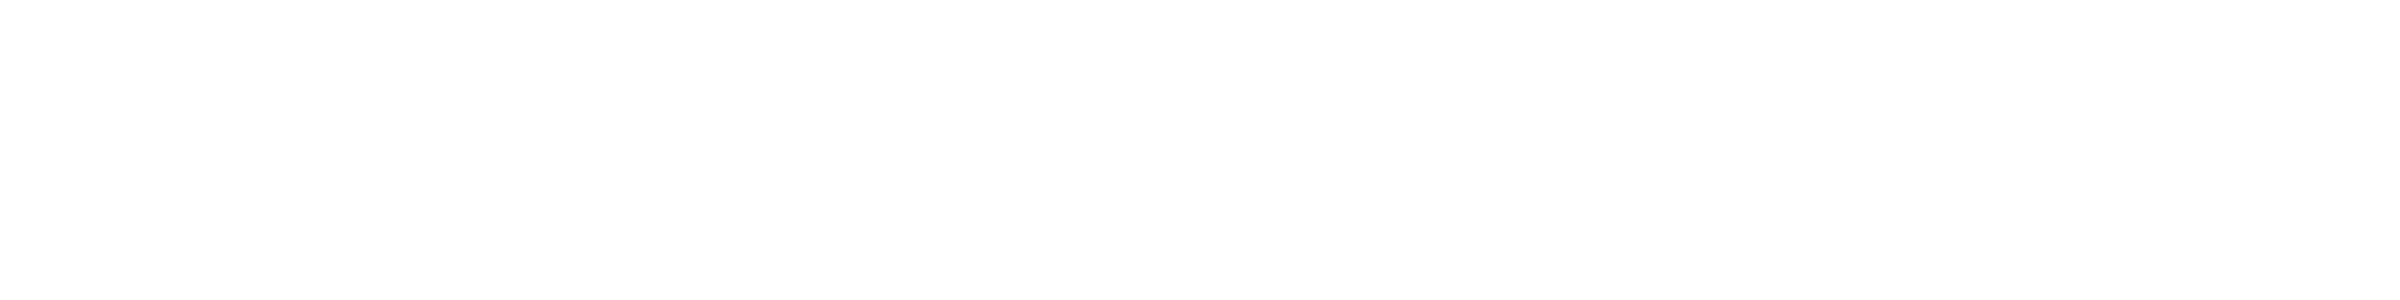 https://data-stars.com/wp-content/uploads/2020/09/bottom_wave_02.png